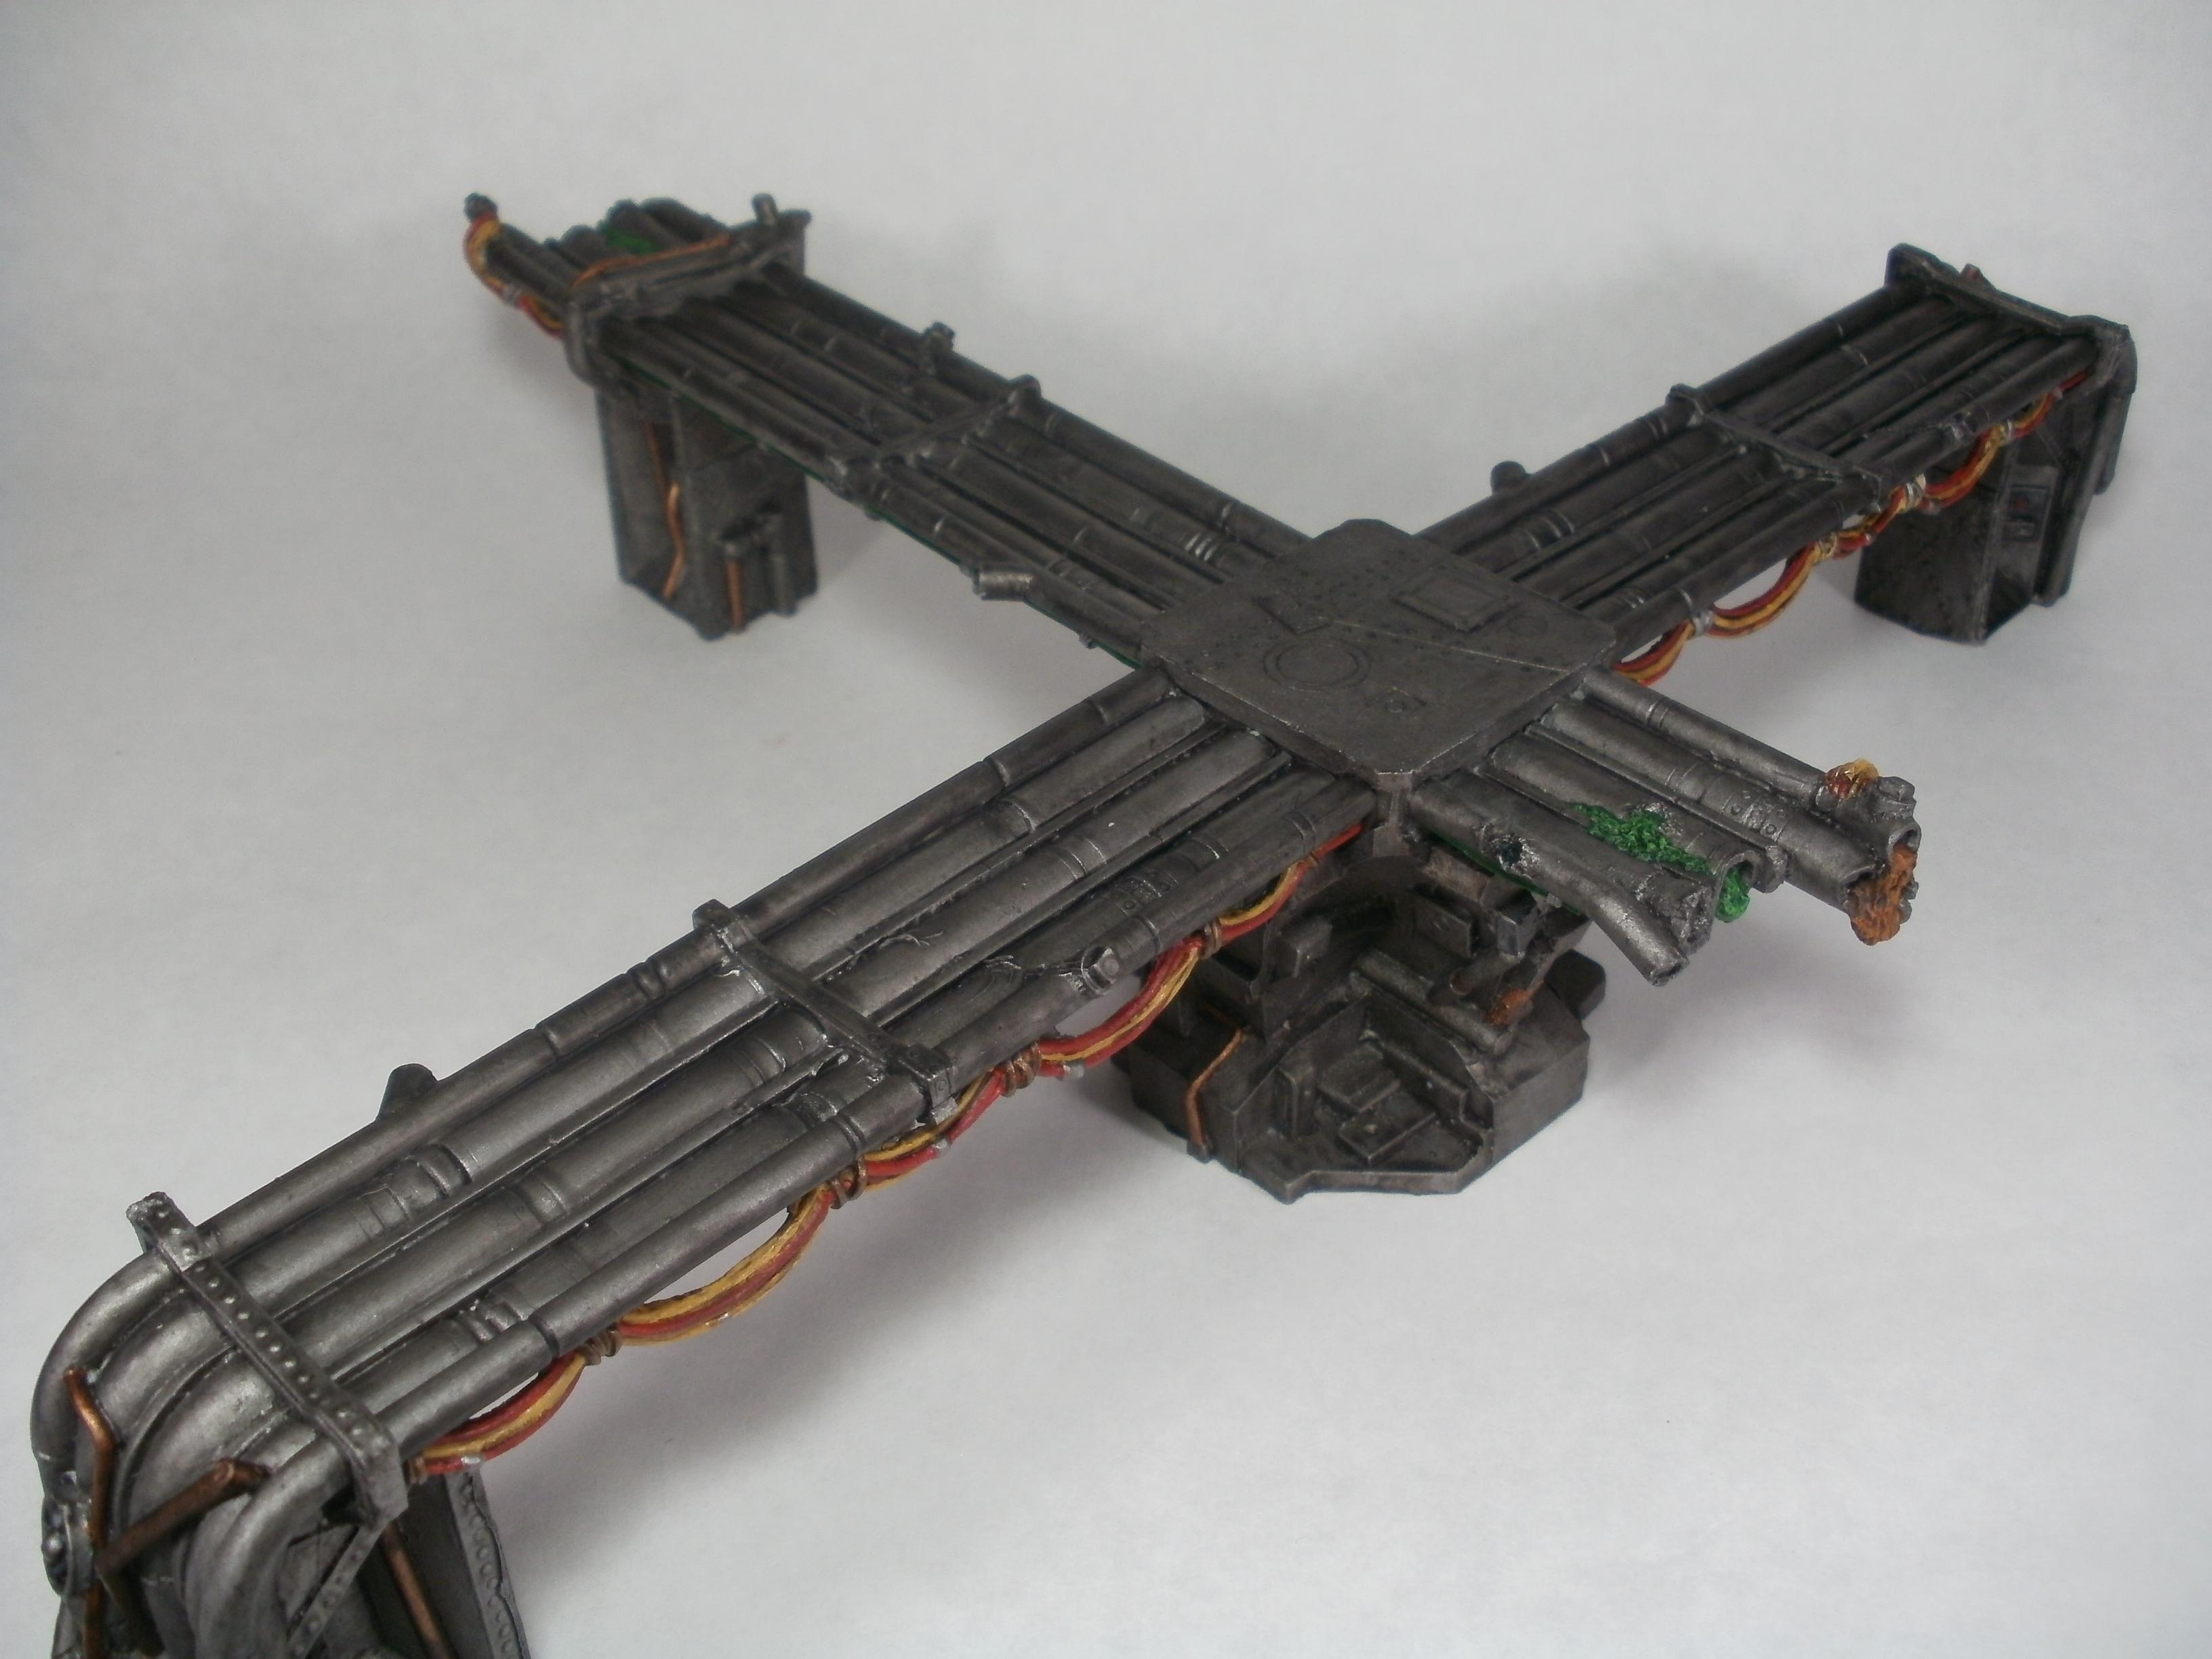 Armorcast, Pipeline, Armorcast Pipeline Set